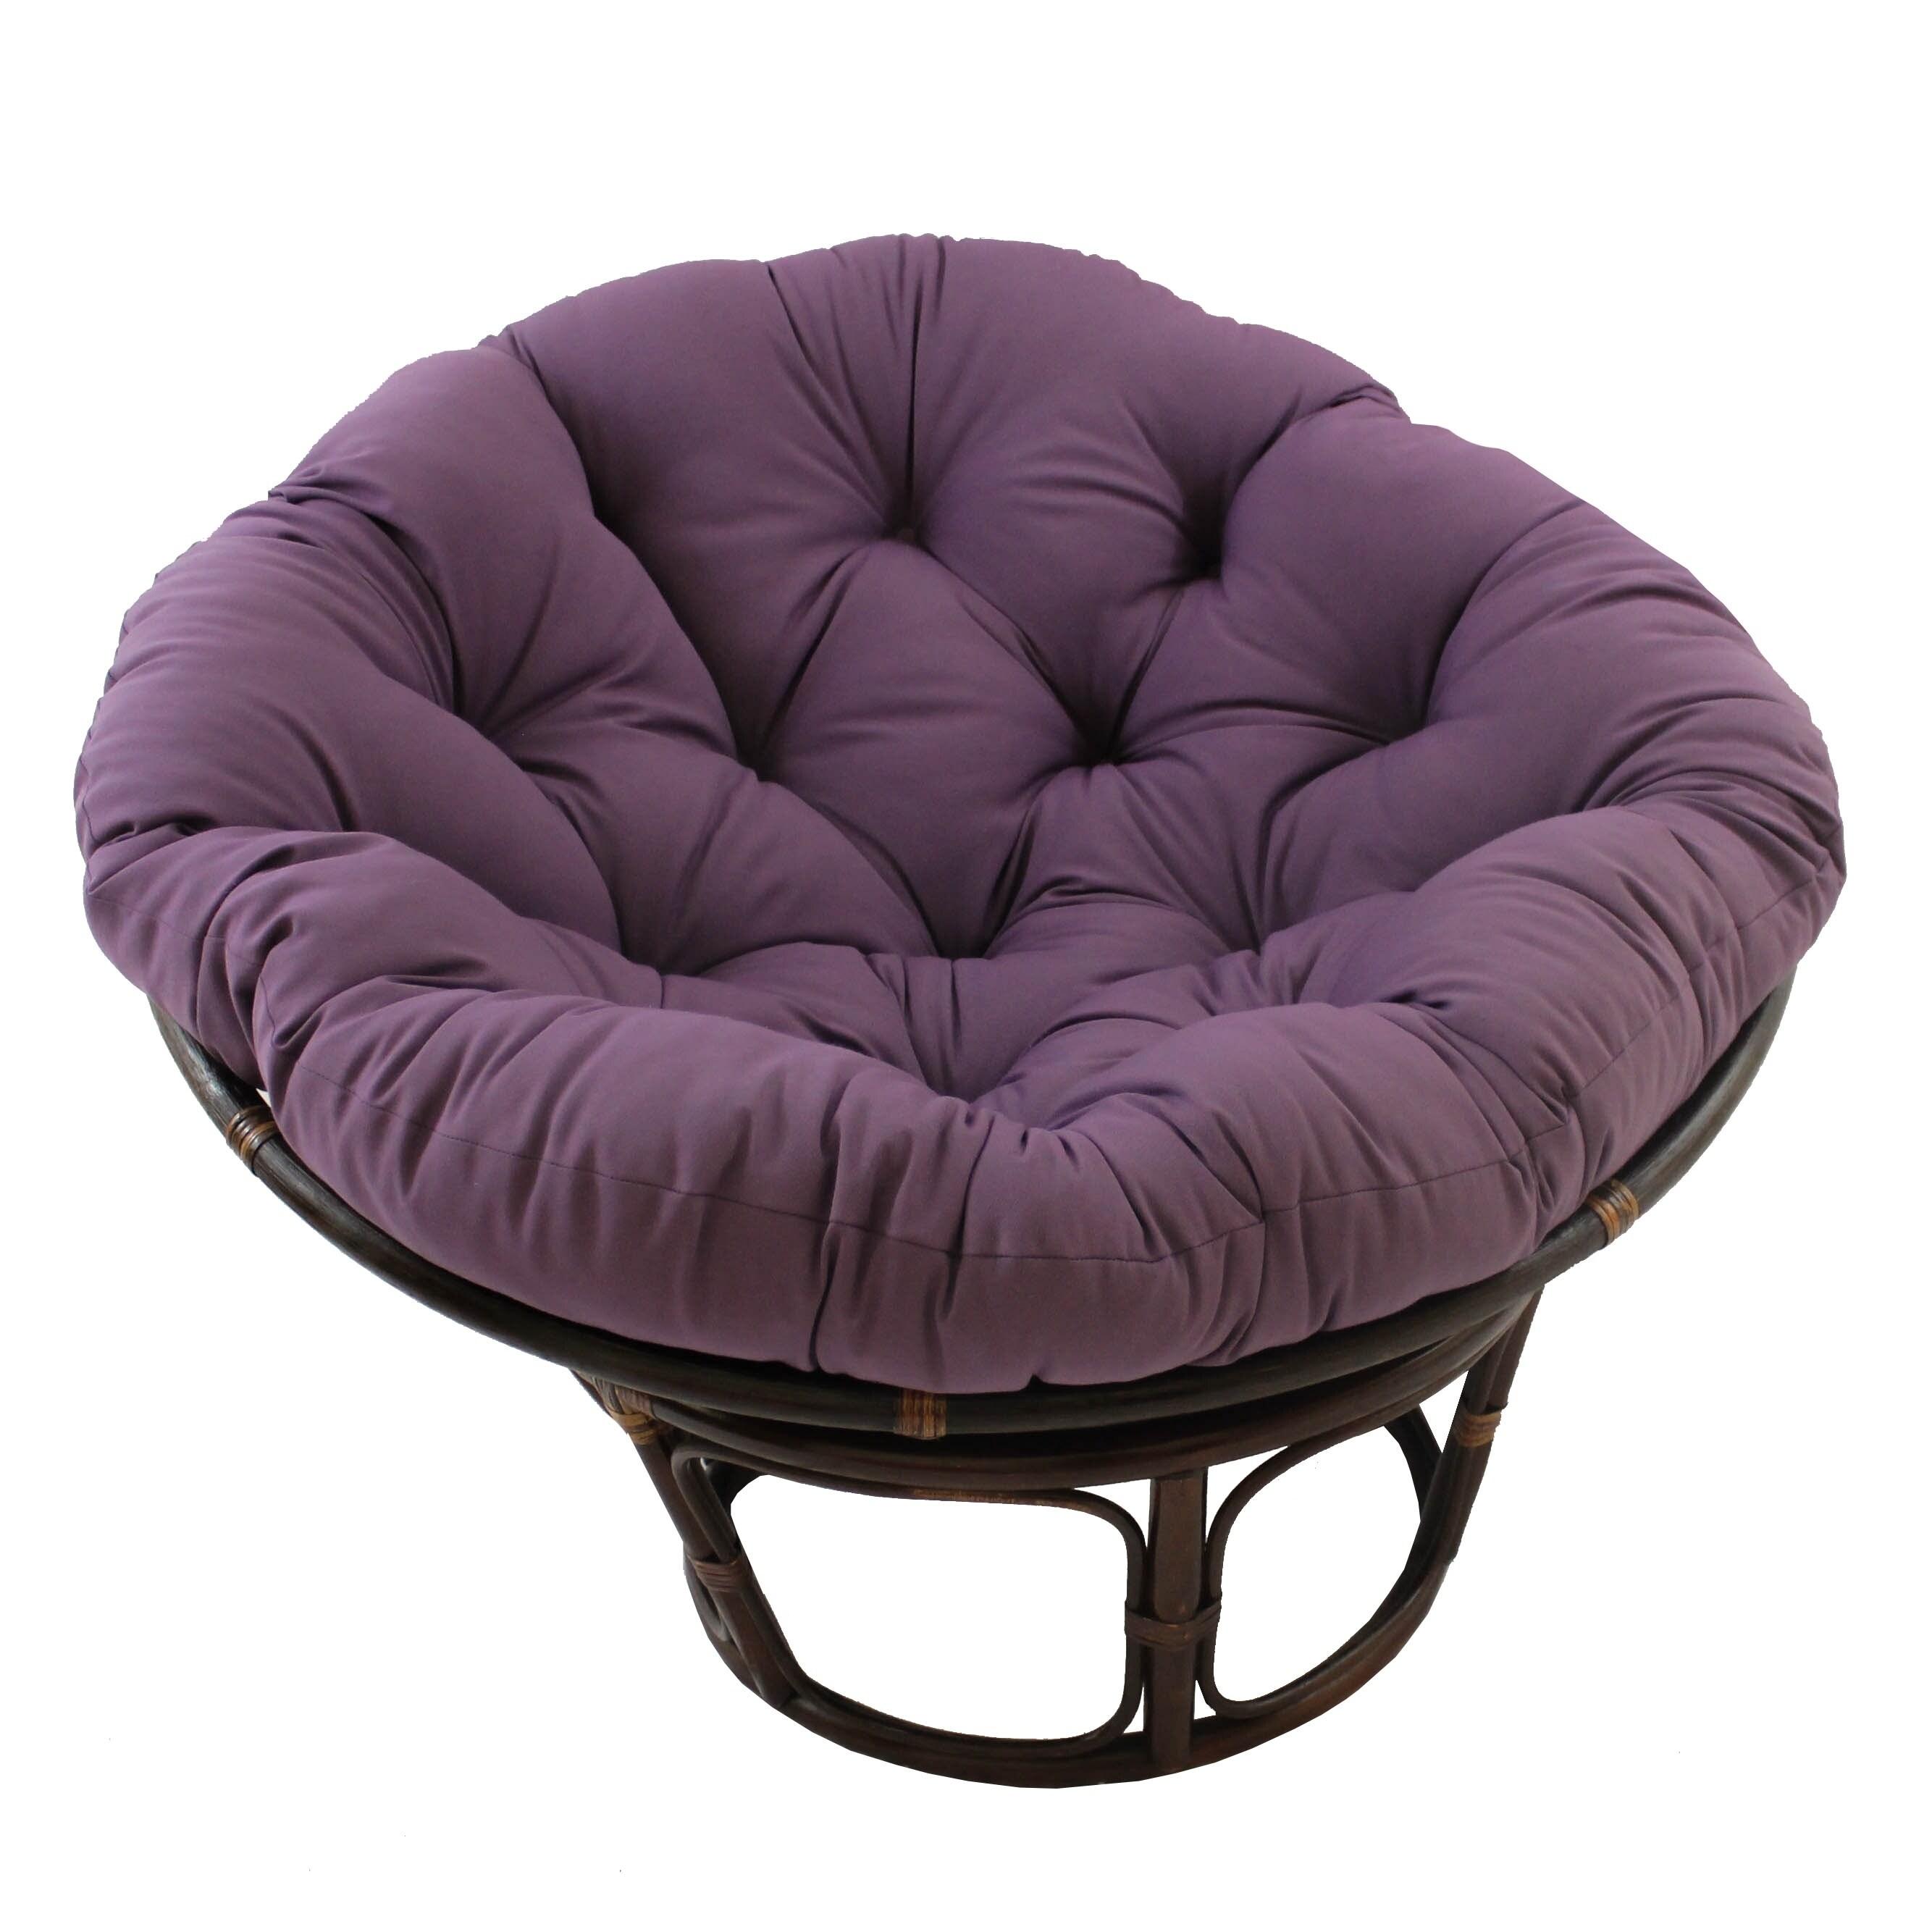 International Caravan Bali Papasan Chair With Solid Cushion  Free